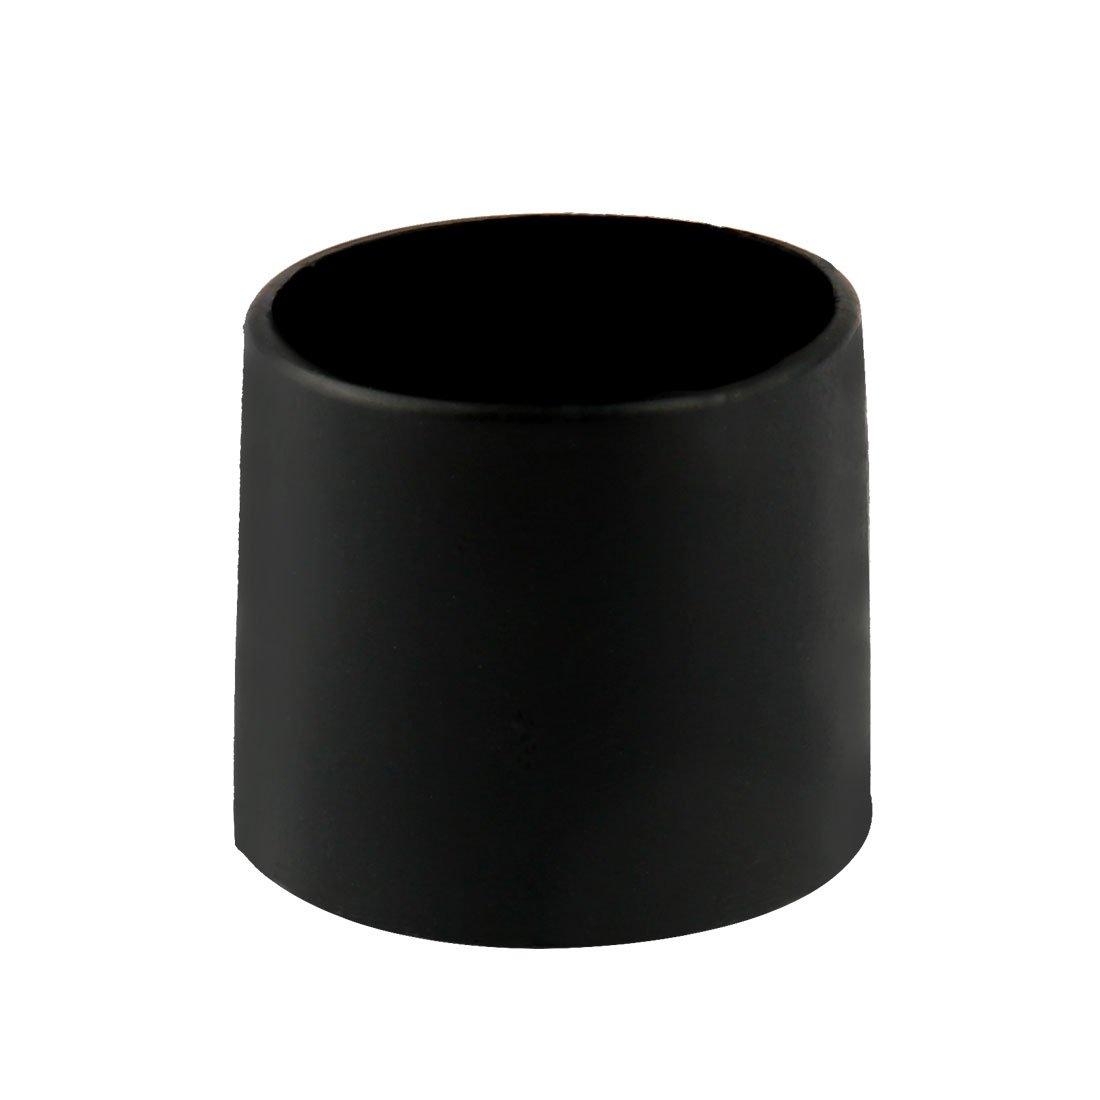 Sourcingmap PVC Leg Cap Tip Cup Feet Cover 22mm 0.87